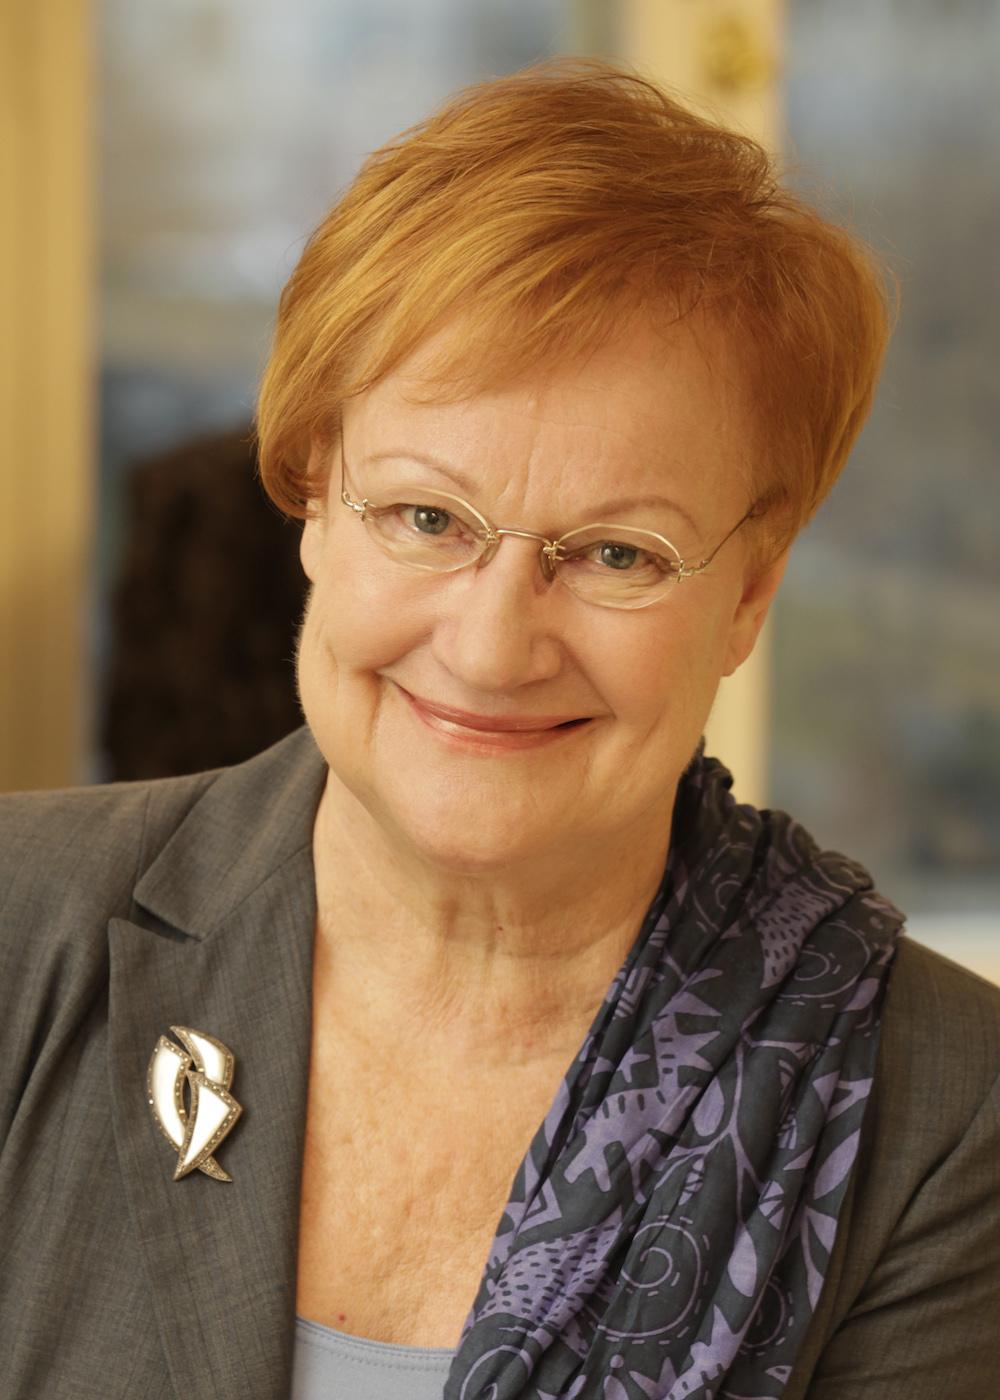 Tarja Halonen, President of Finland 2000-2012